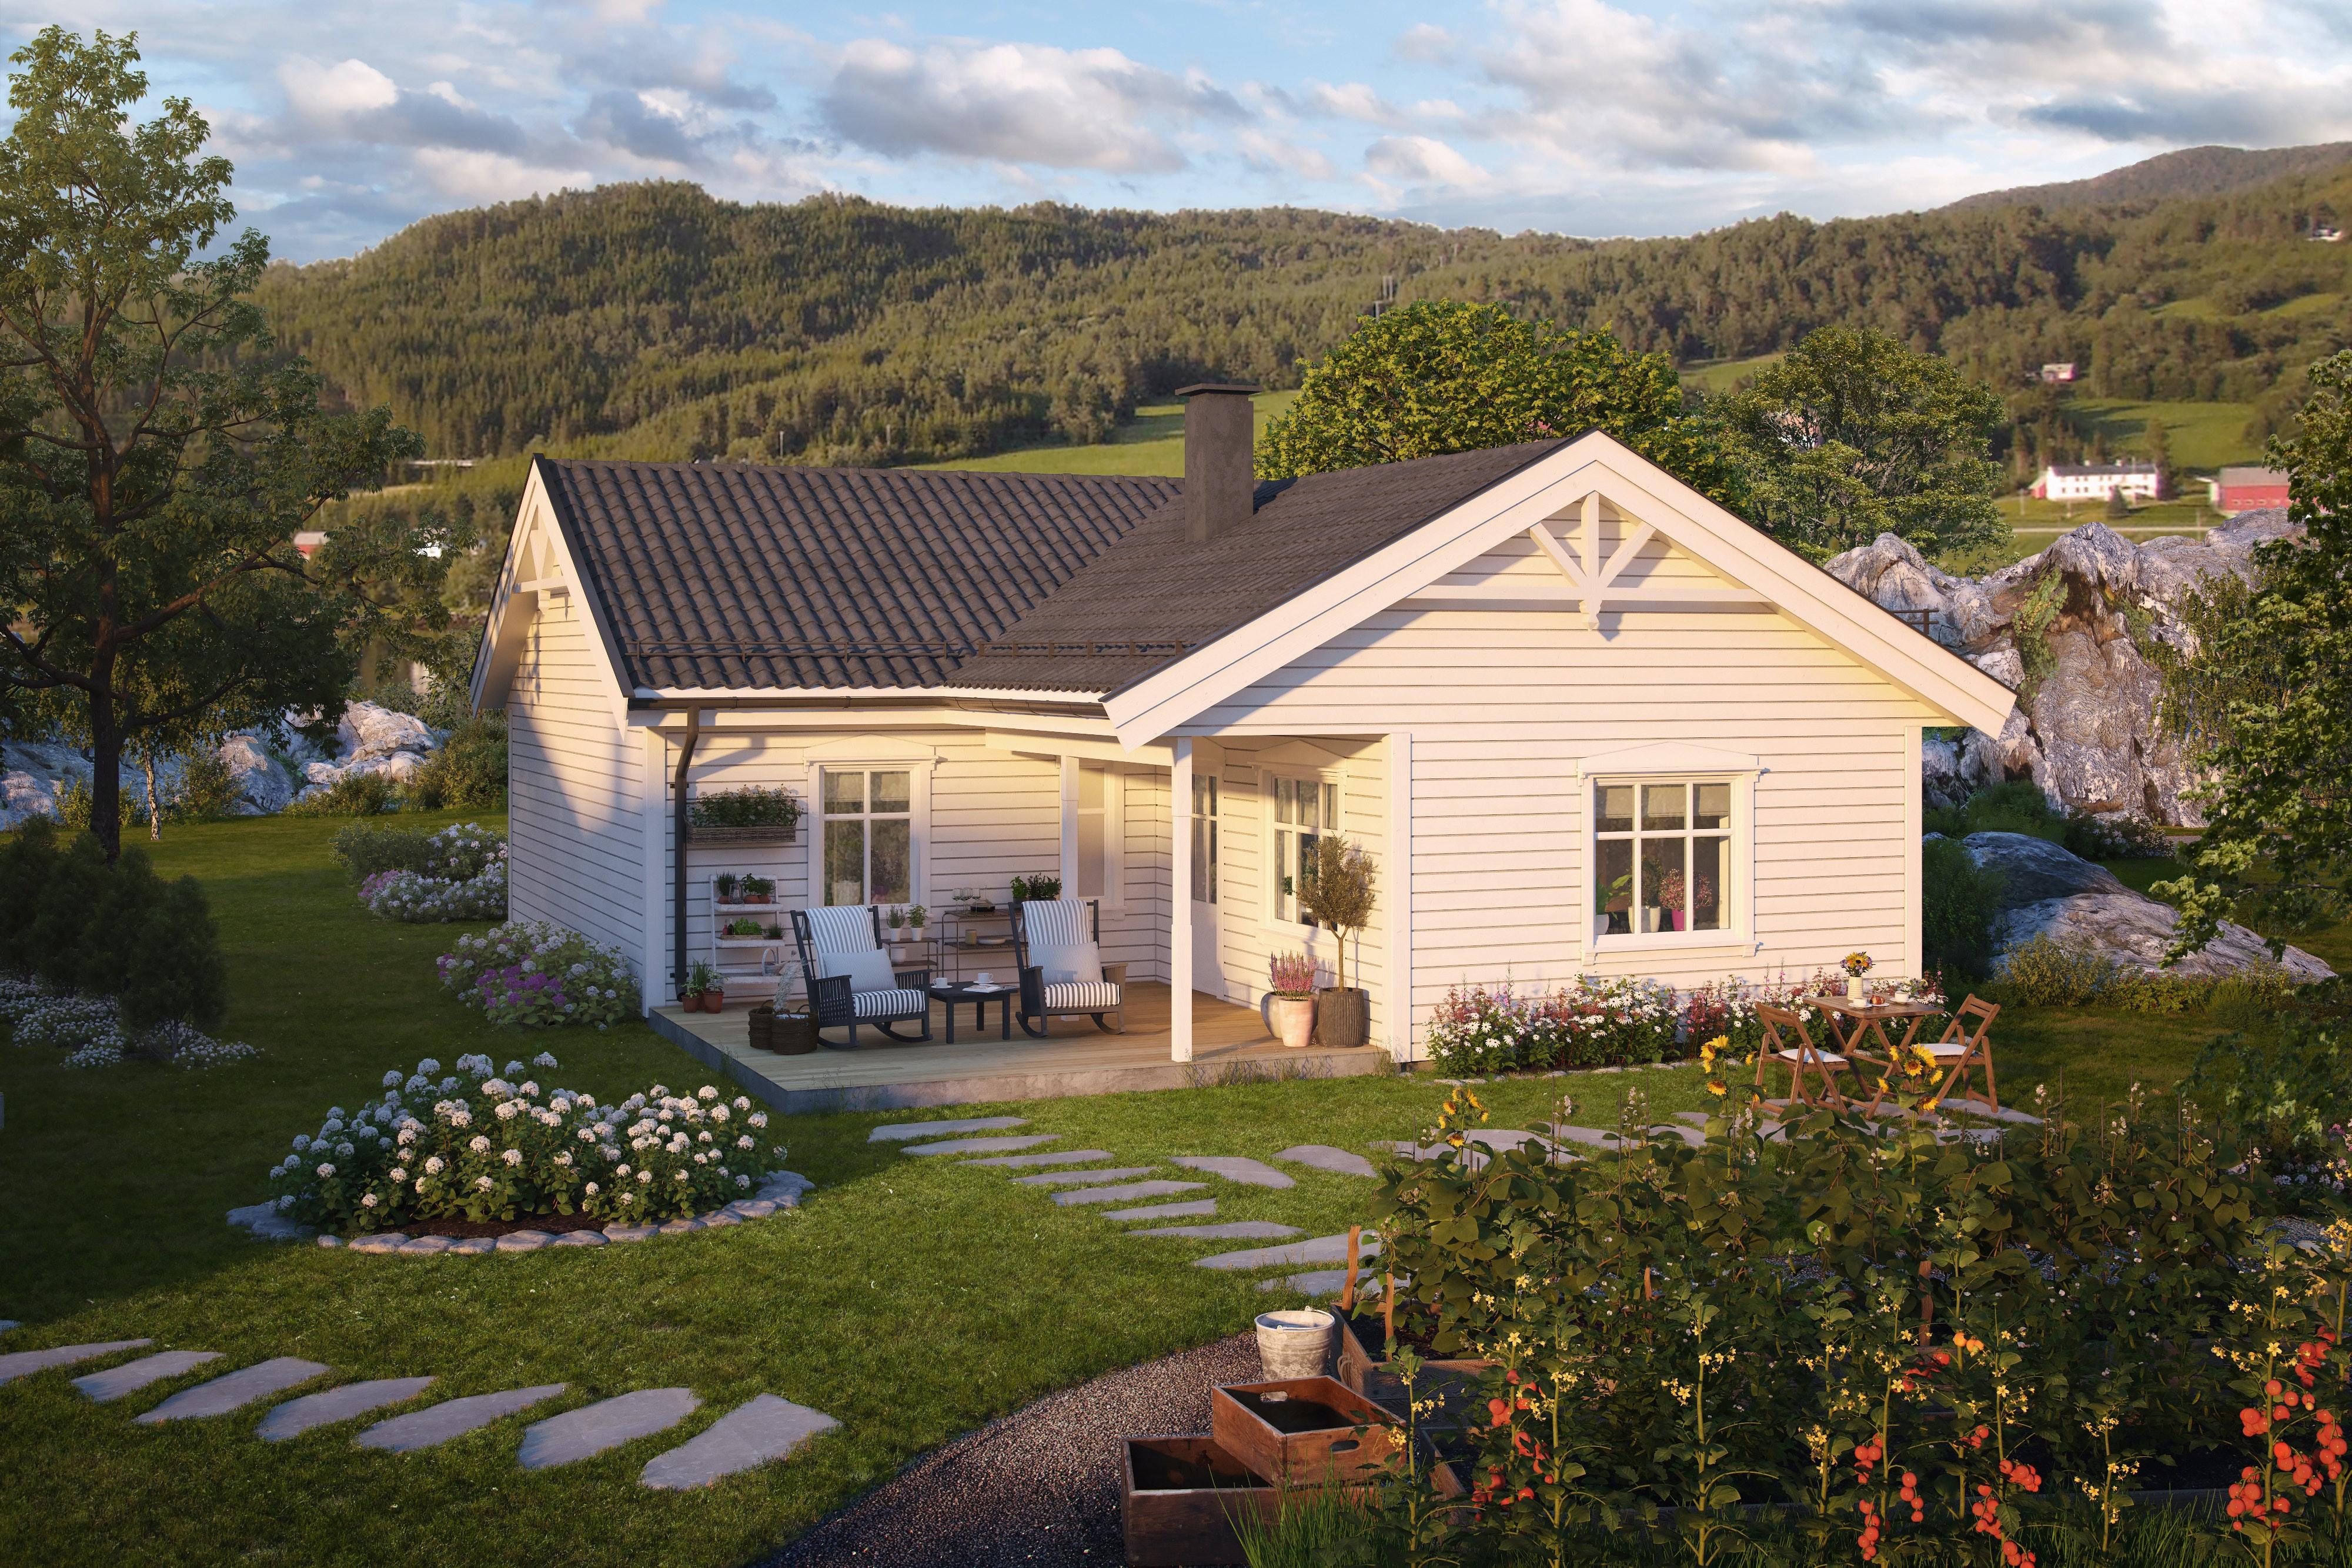 LÅNEKOST KUN 5.962/mnd! NY innholdsrik bolig i nytt boligfelt mellom Kristiansand og Birkeland!